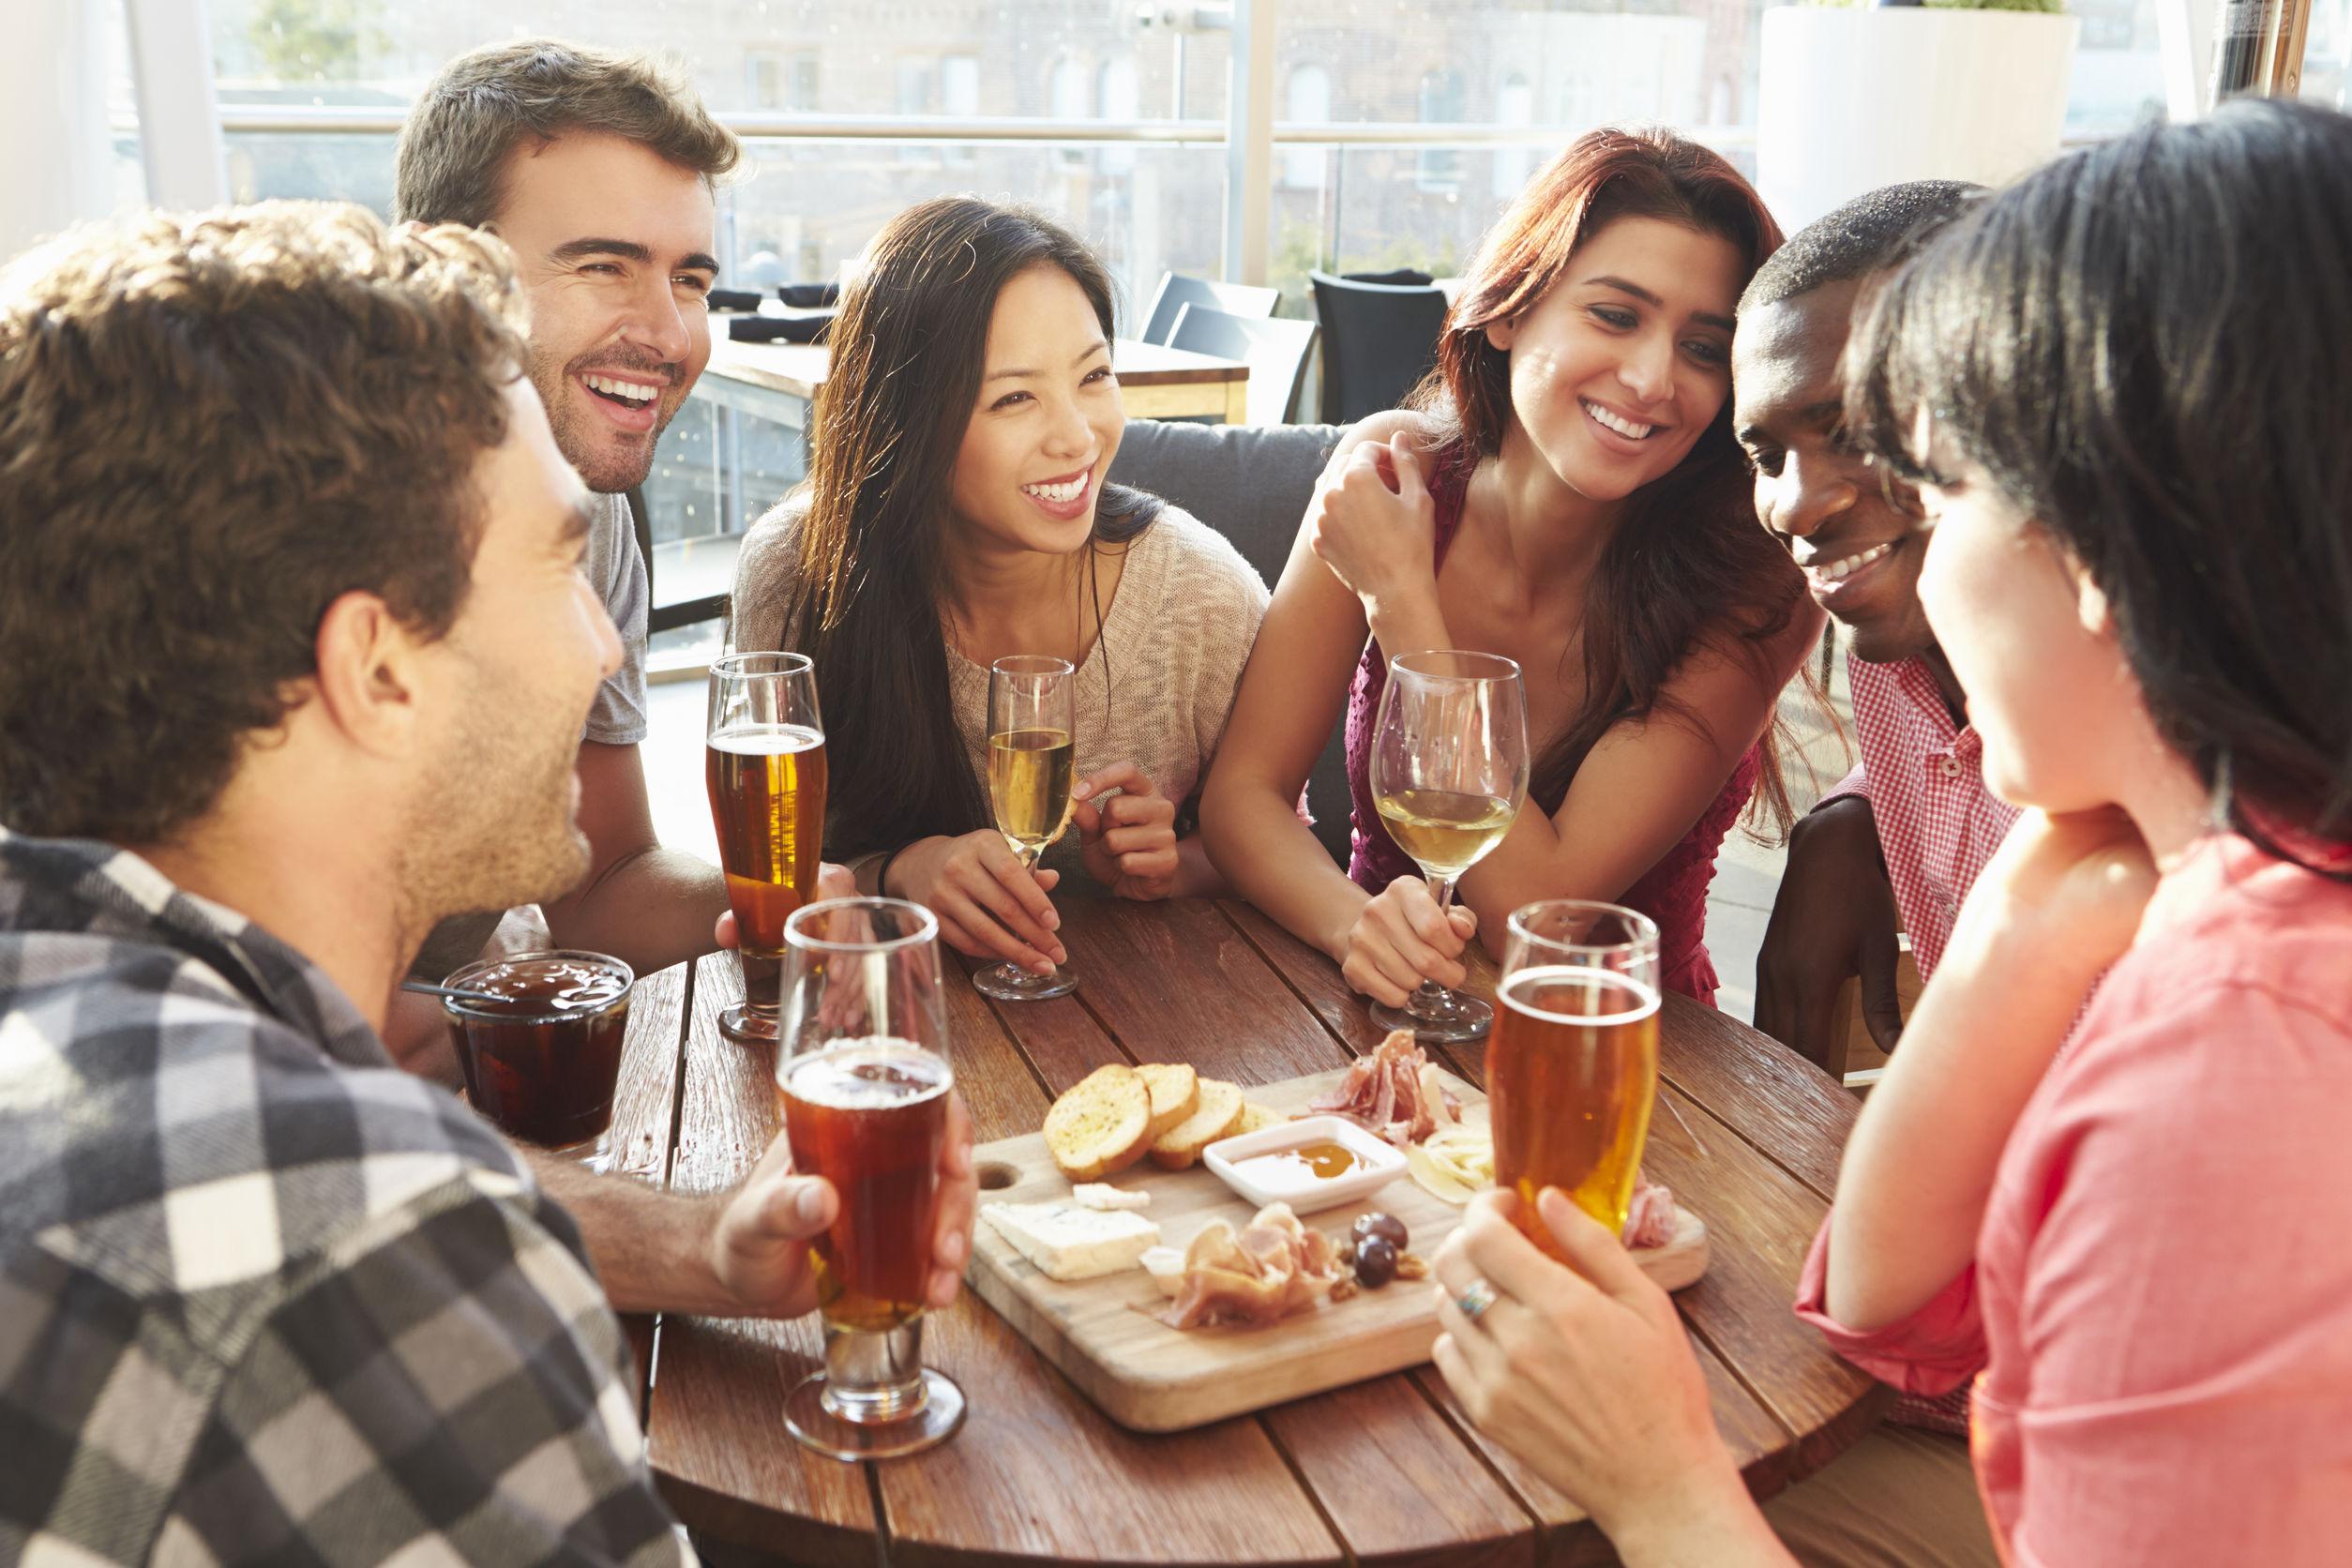 Italian habits - No drinking on empty stomachs